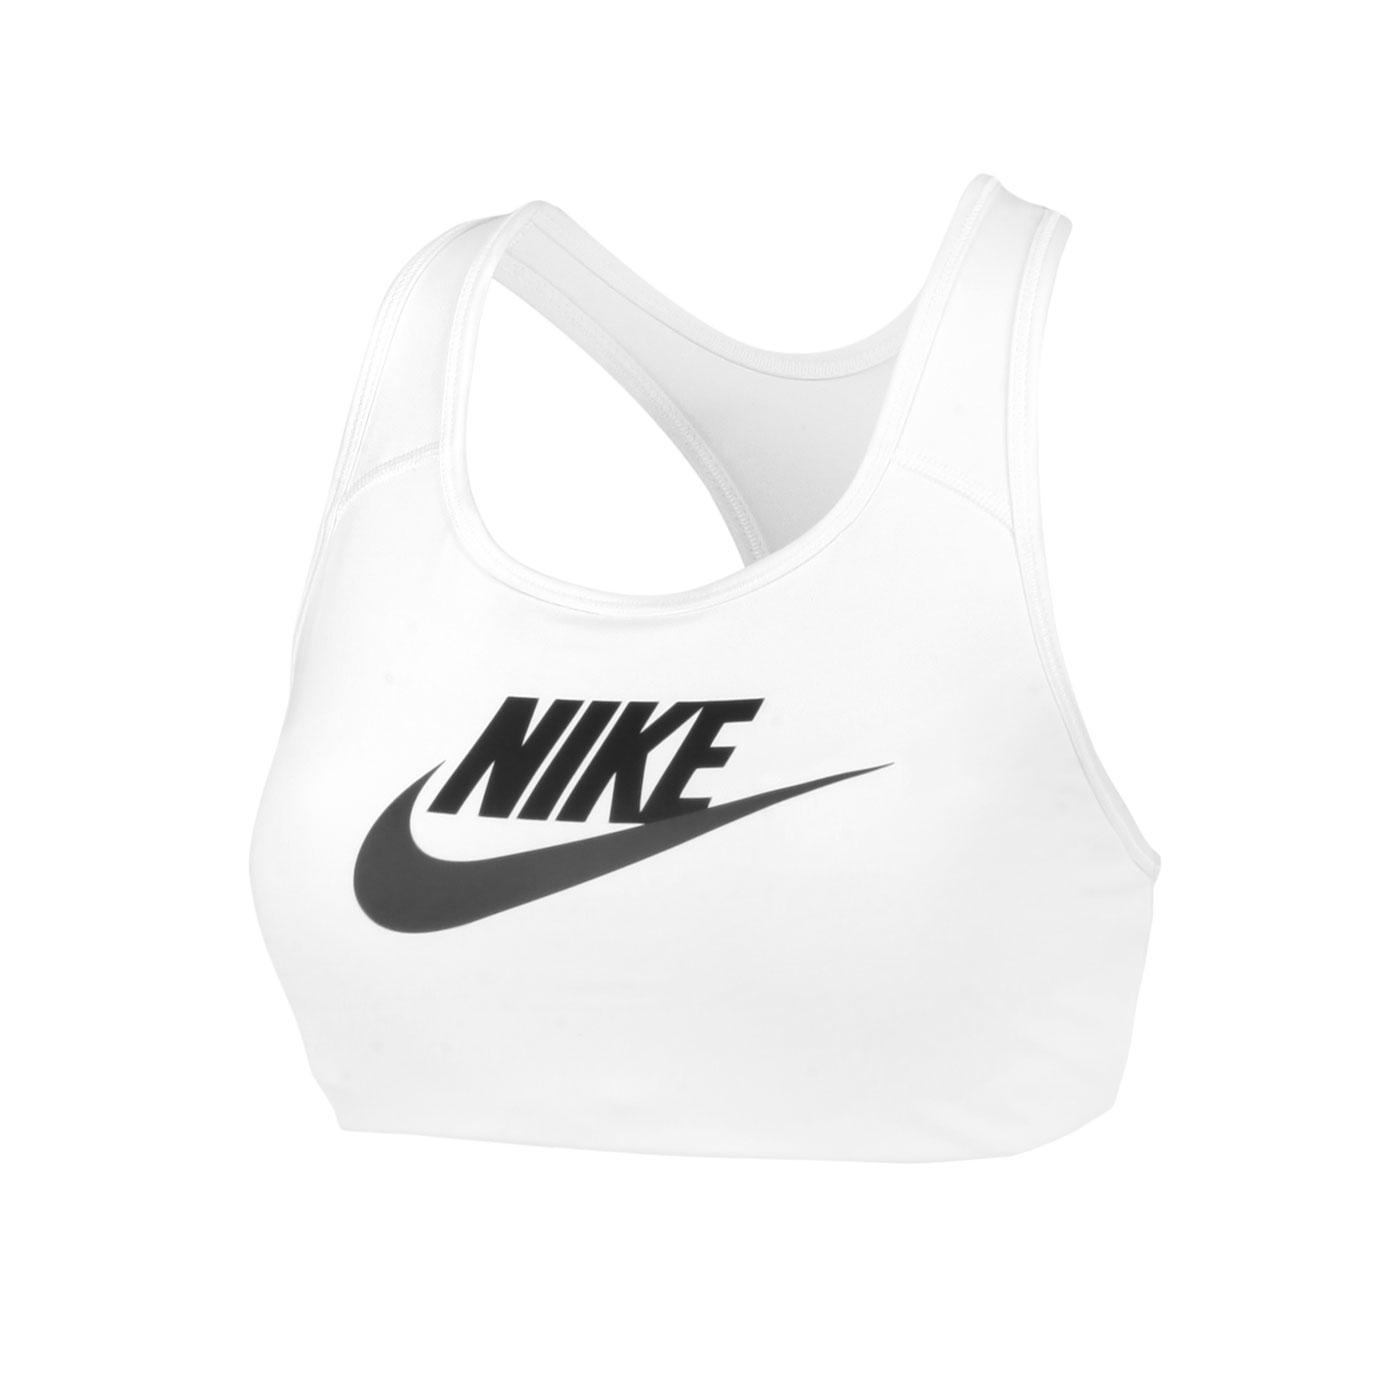 NIKE 女款運動內衣 DM0580-100 - 白黑